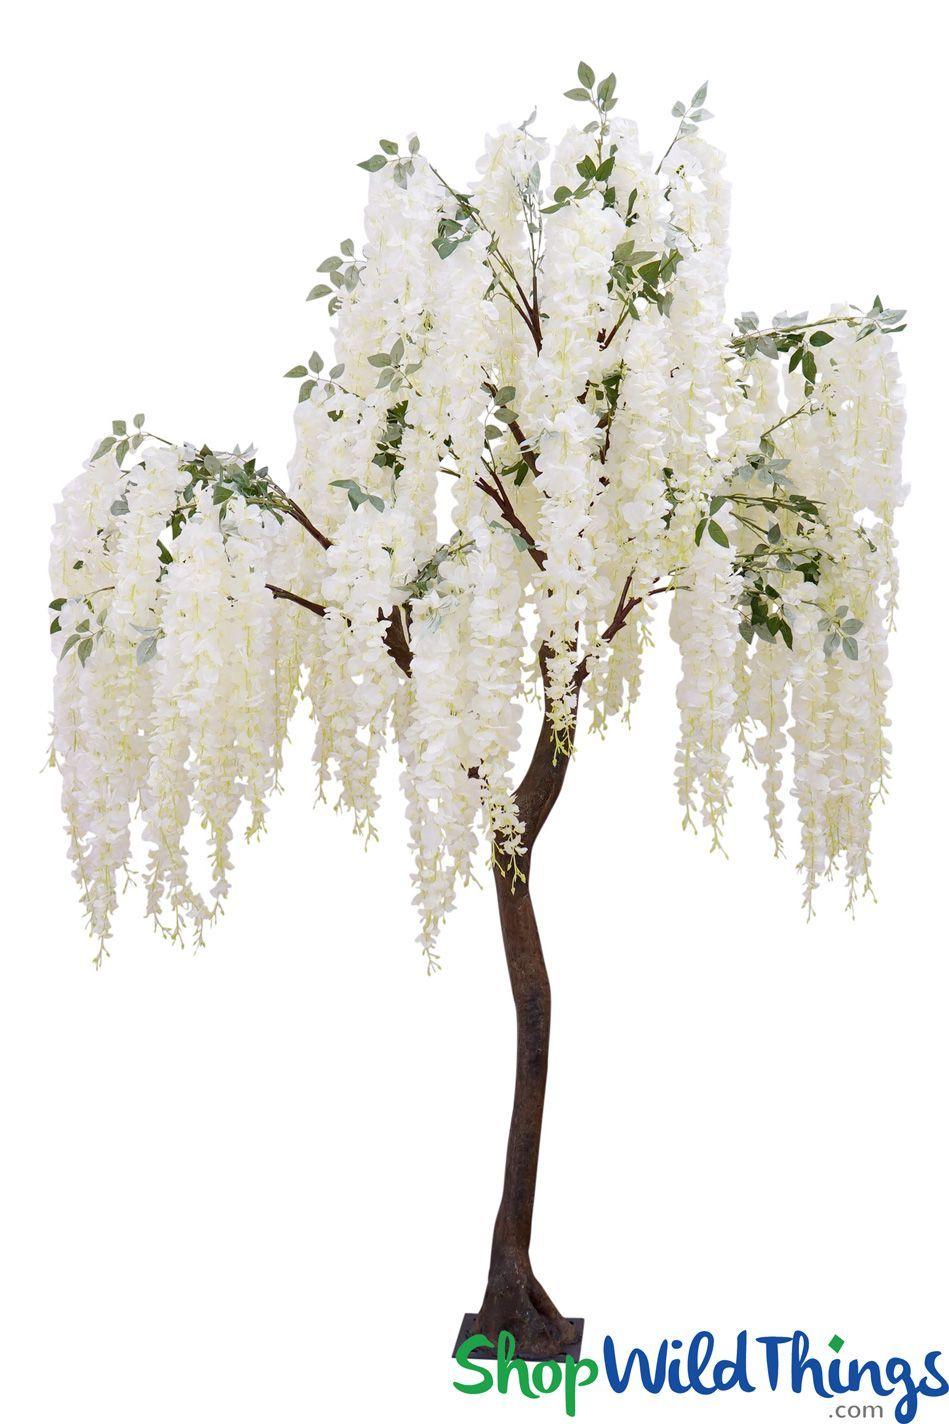 Snow Fountain Cream Flowering Weeping Cherry Tree 8 Feet Tall Weeping Cherry Tree Flowering Trees Cherry Tree